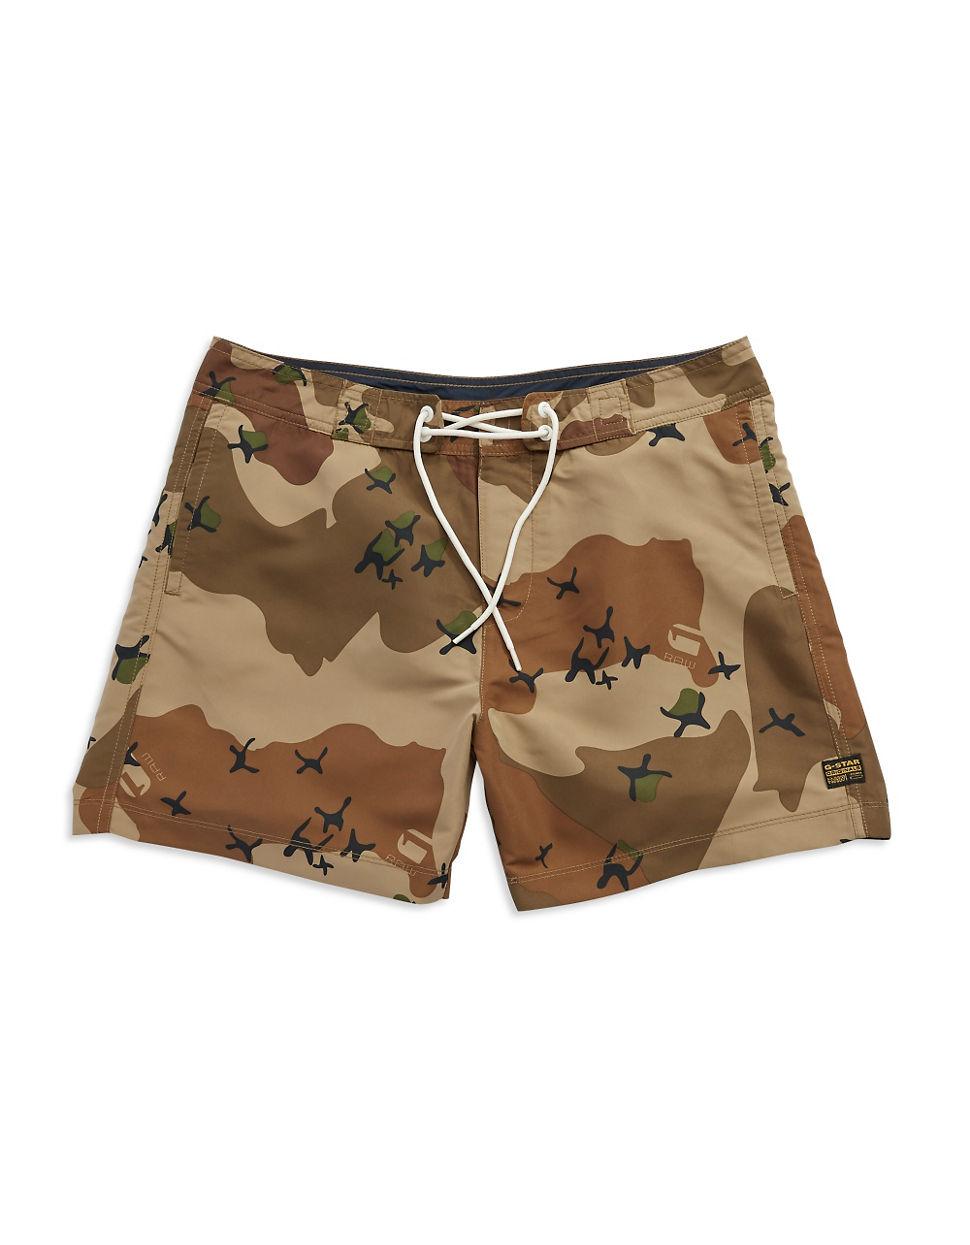 33306160712a Lyst - G-Star Raw Jordan Swim Shorts in Brown for Men